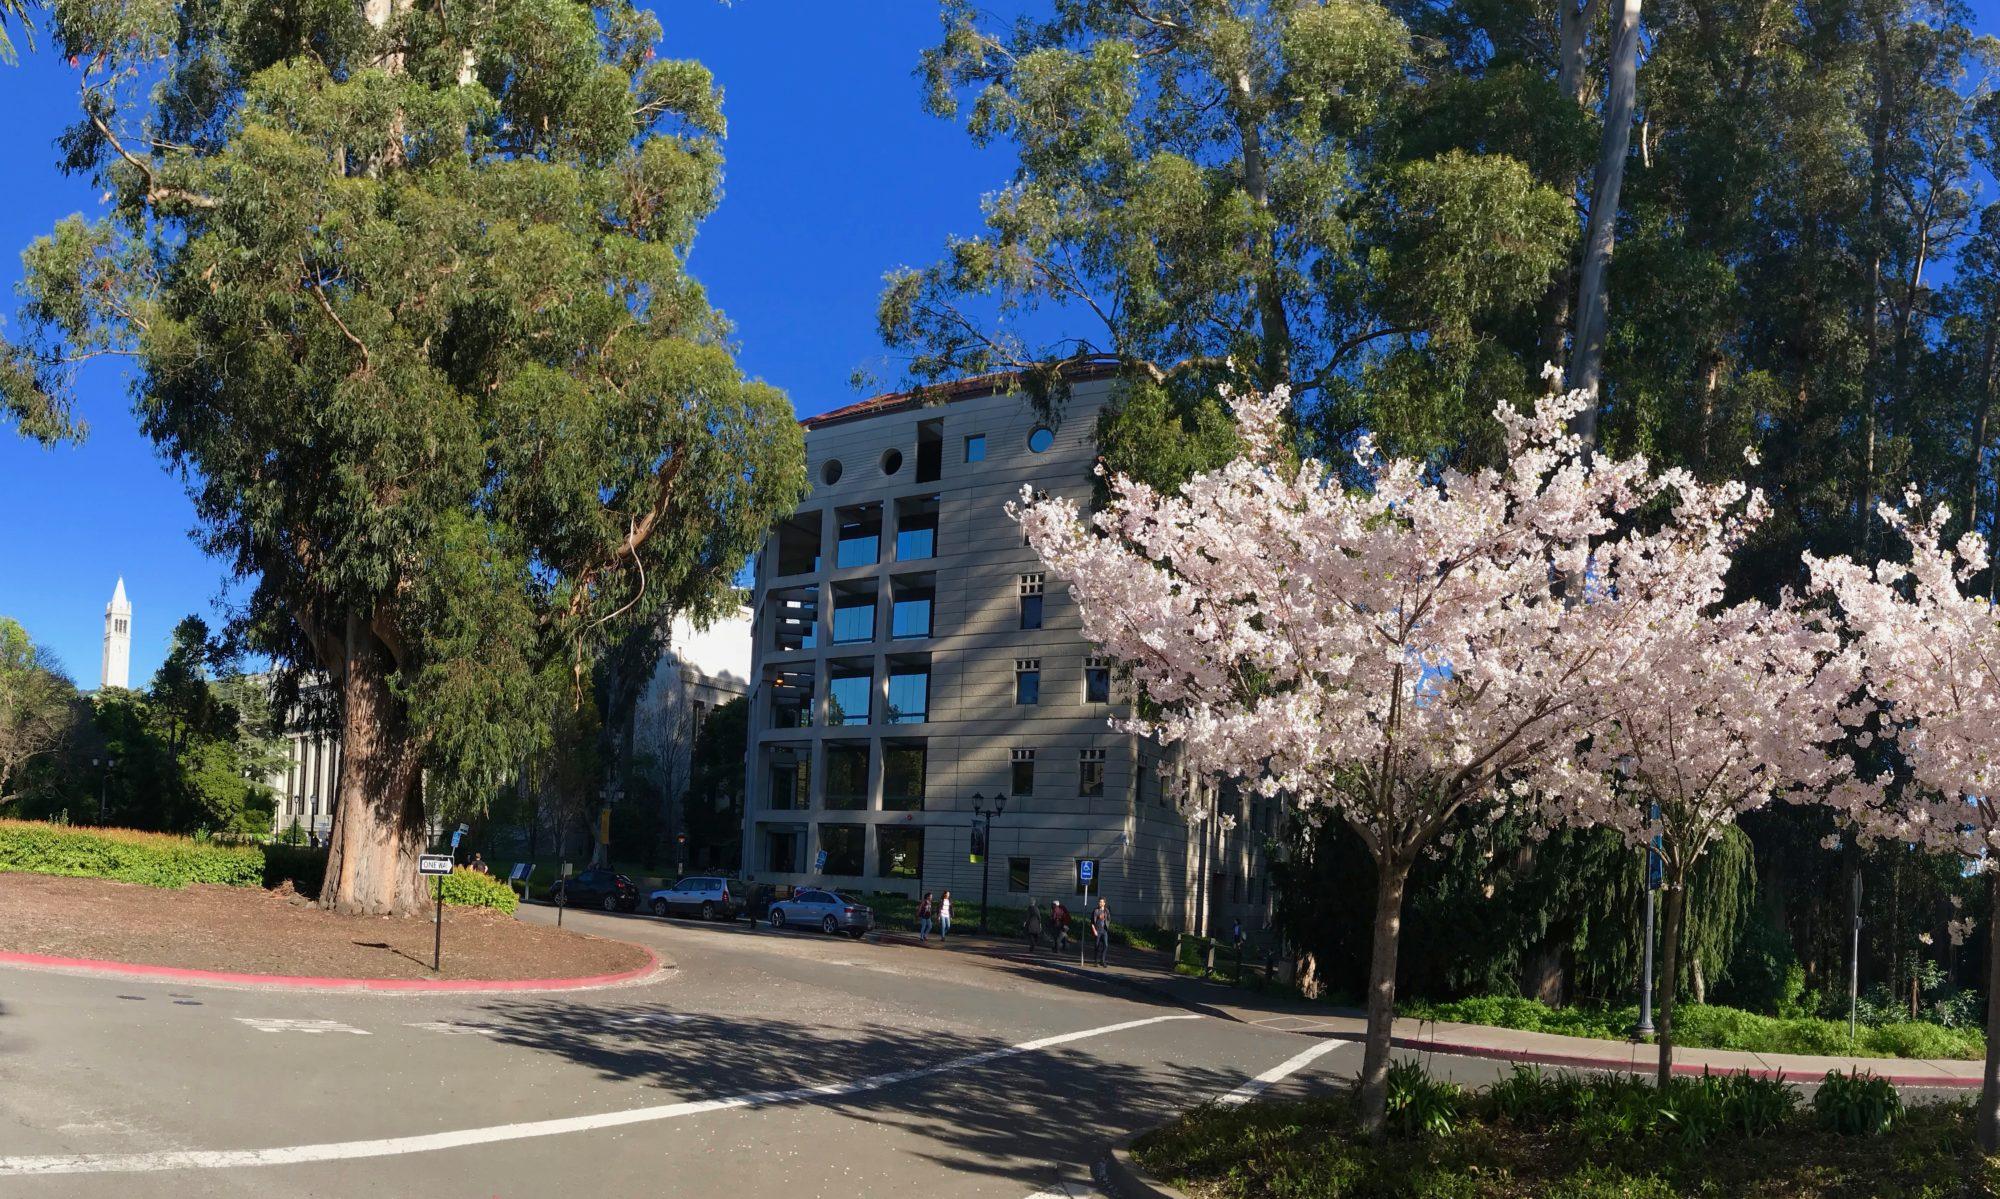 Vance Lab at UC Berkeley